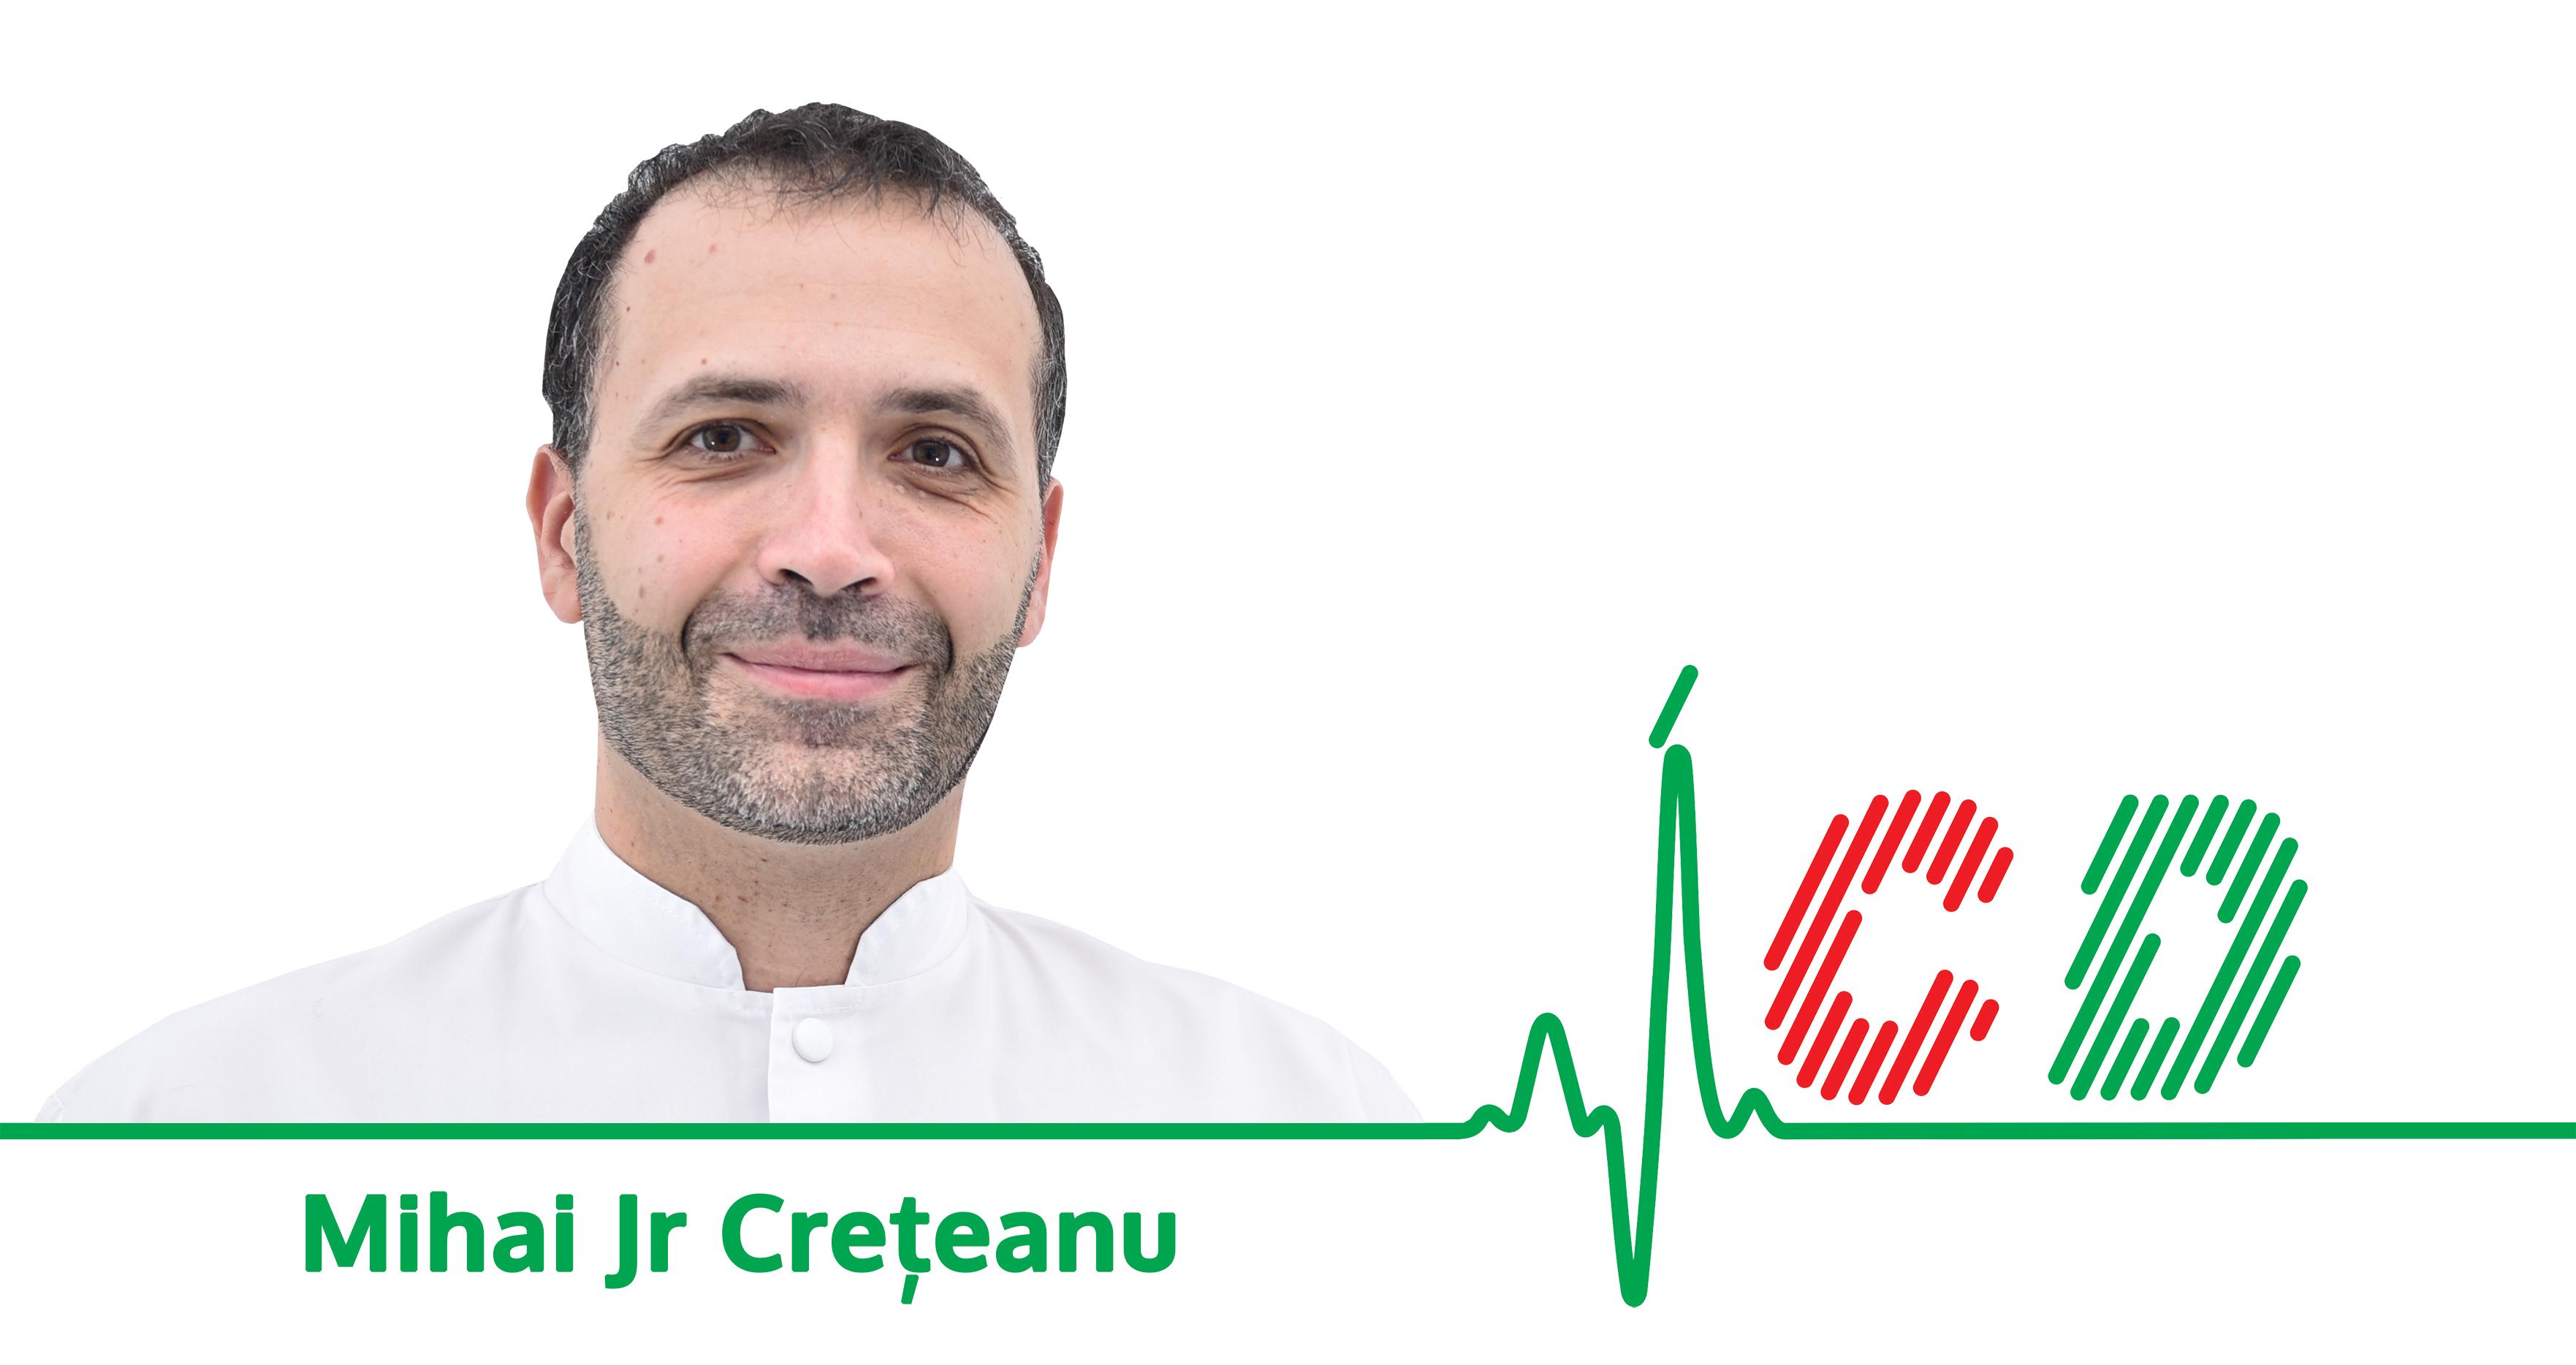 Dr.  Mihai Jr Creteanu